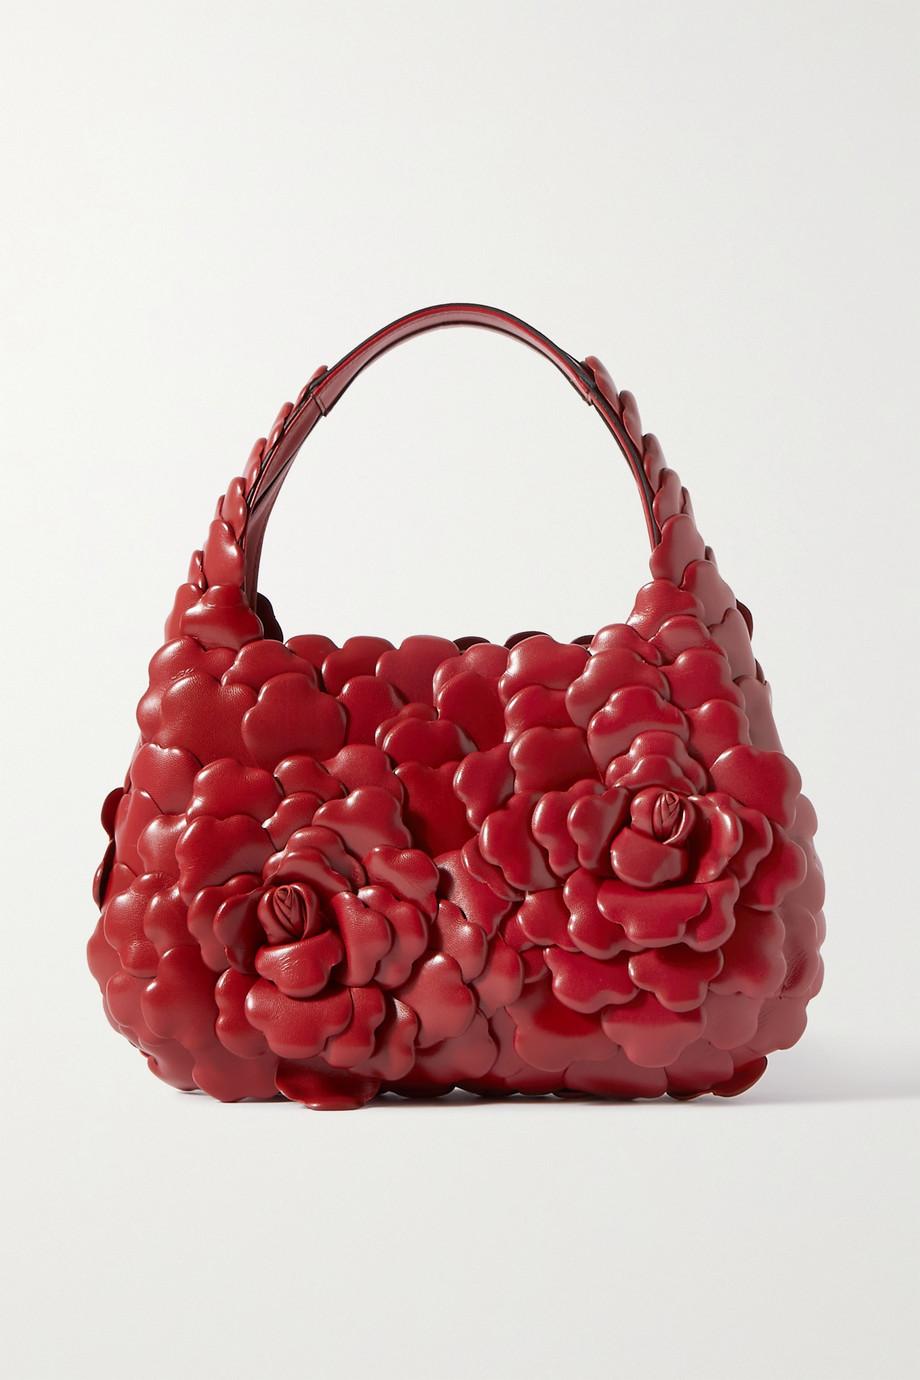 Valentino Sac à main en cuir 03 Rose Edition Atelier Small Valentino Garavani